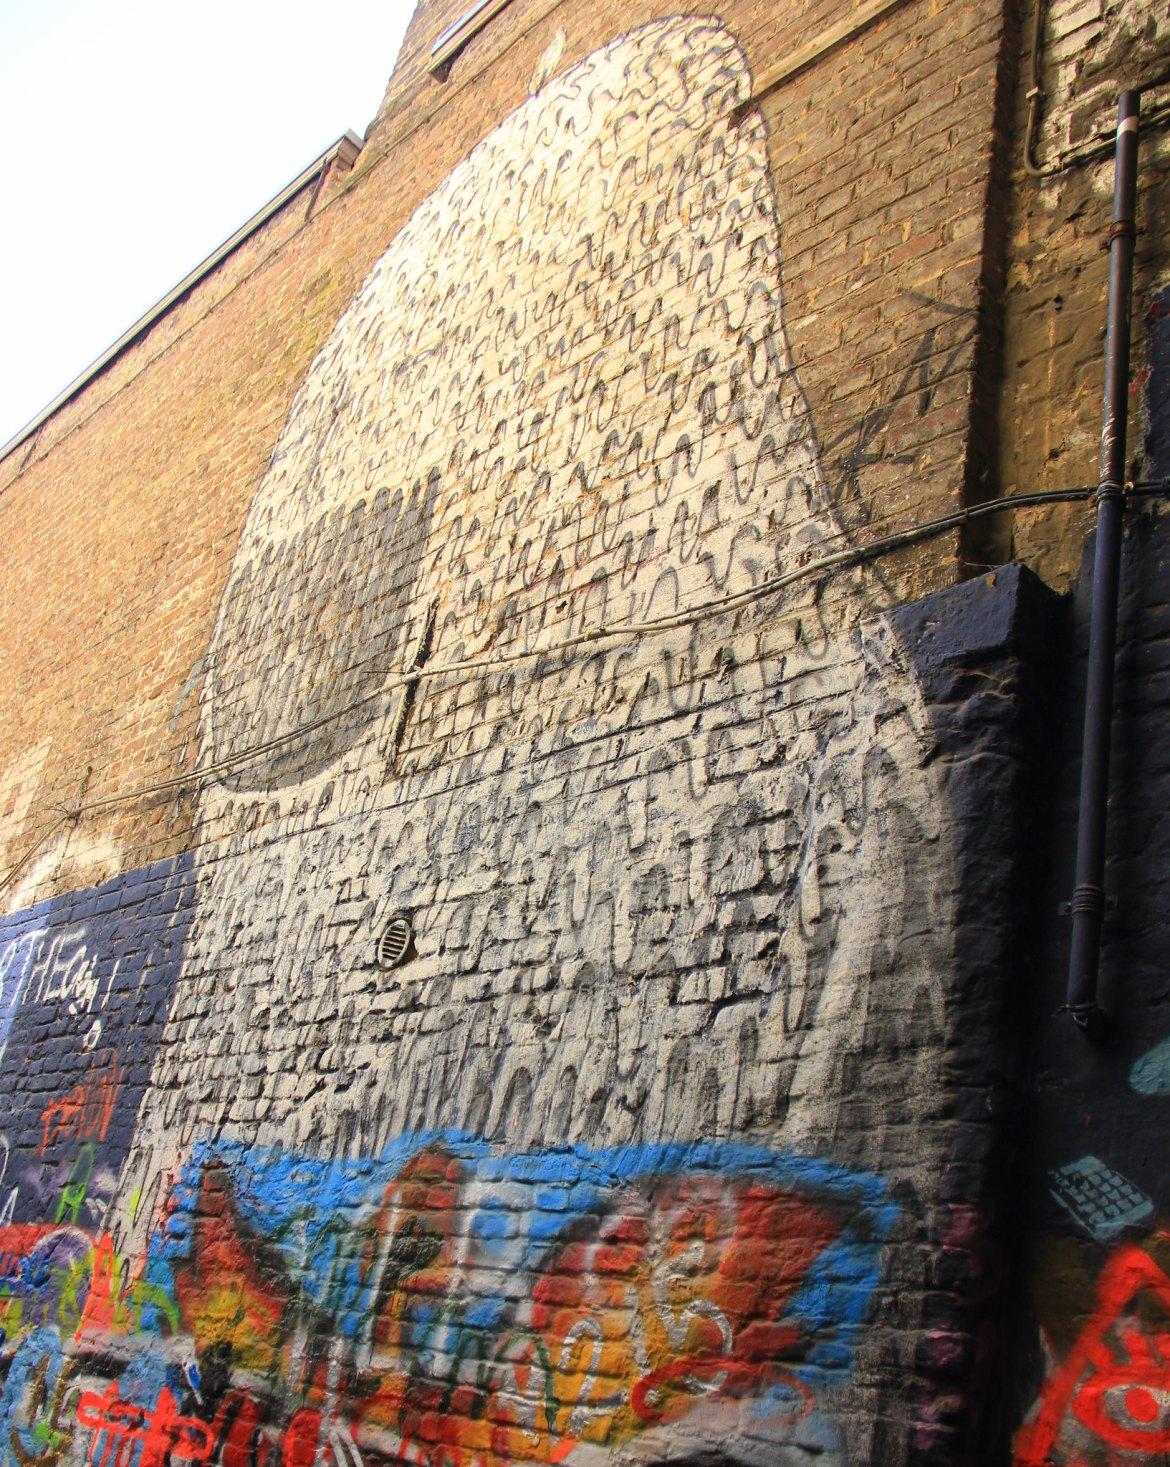 Ghent street art at Graffiti Lane